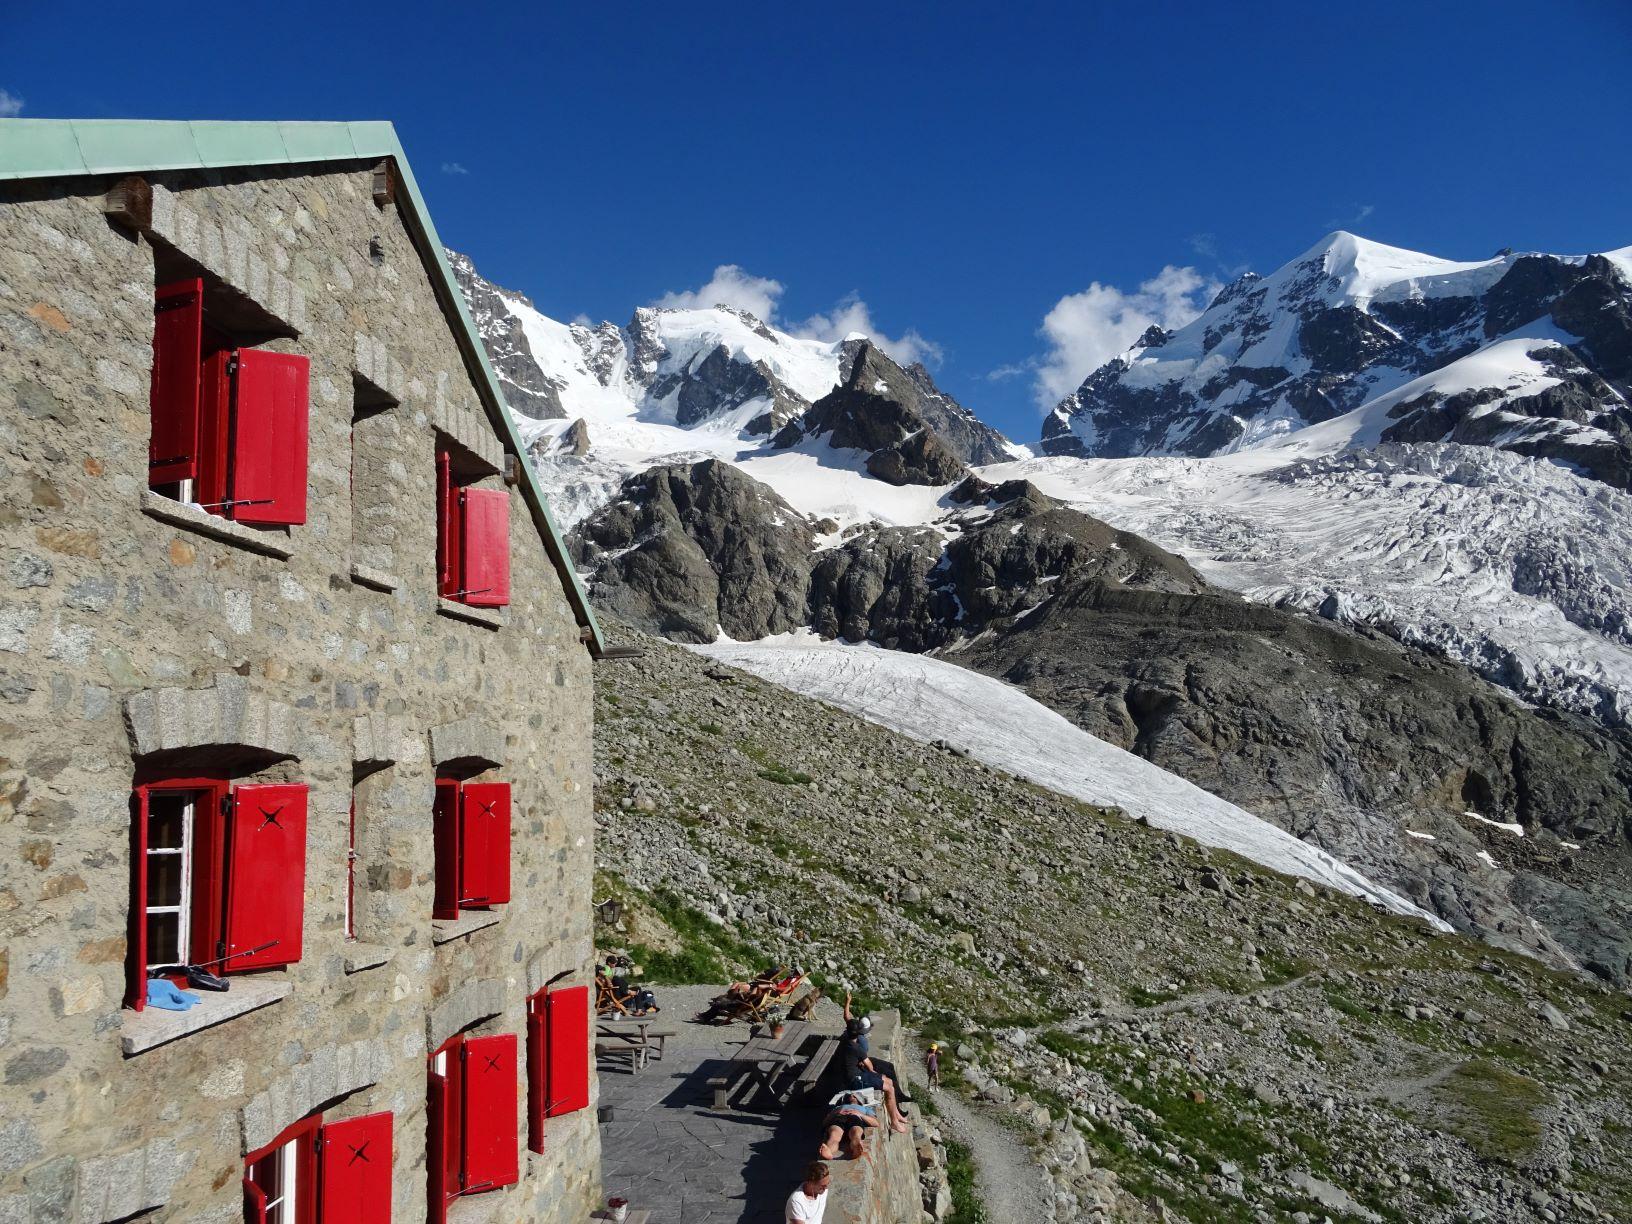 Gross Diamantstock-Monch-Piz Morteratsch-Piz Bernina